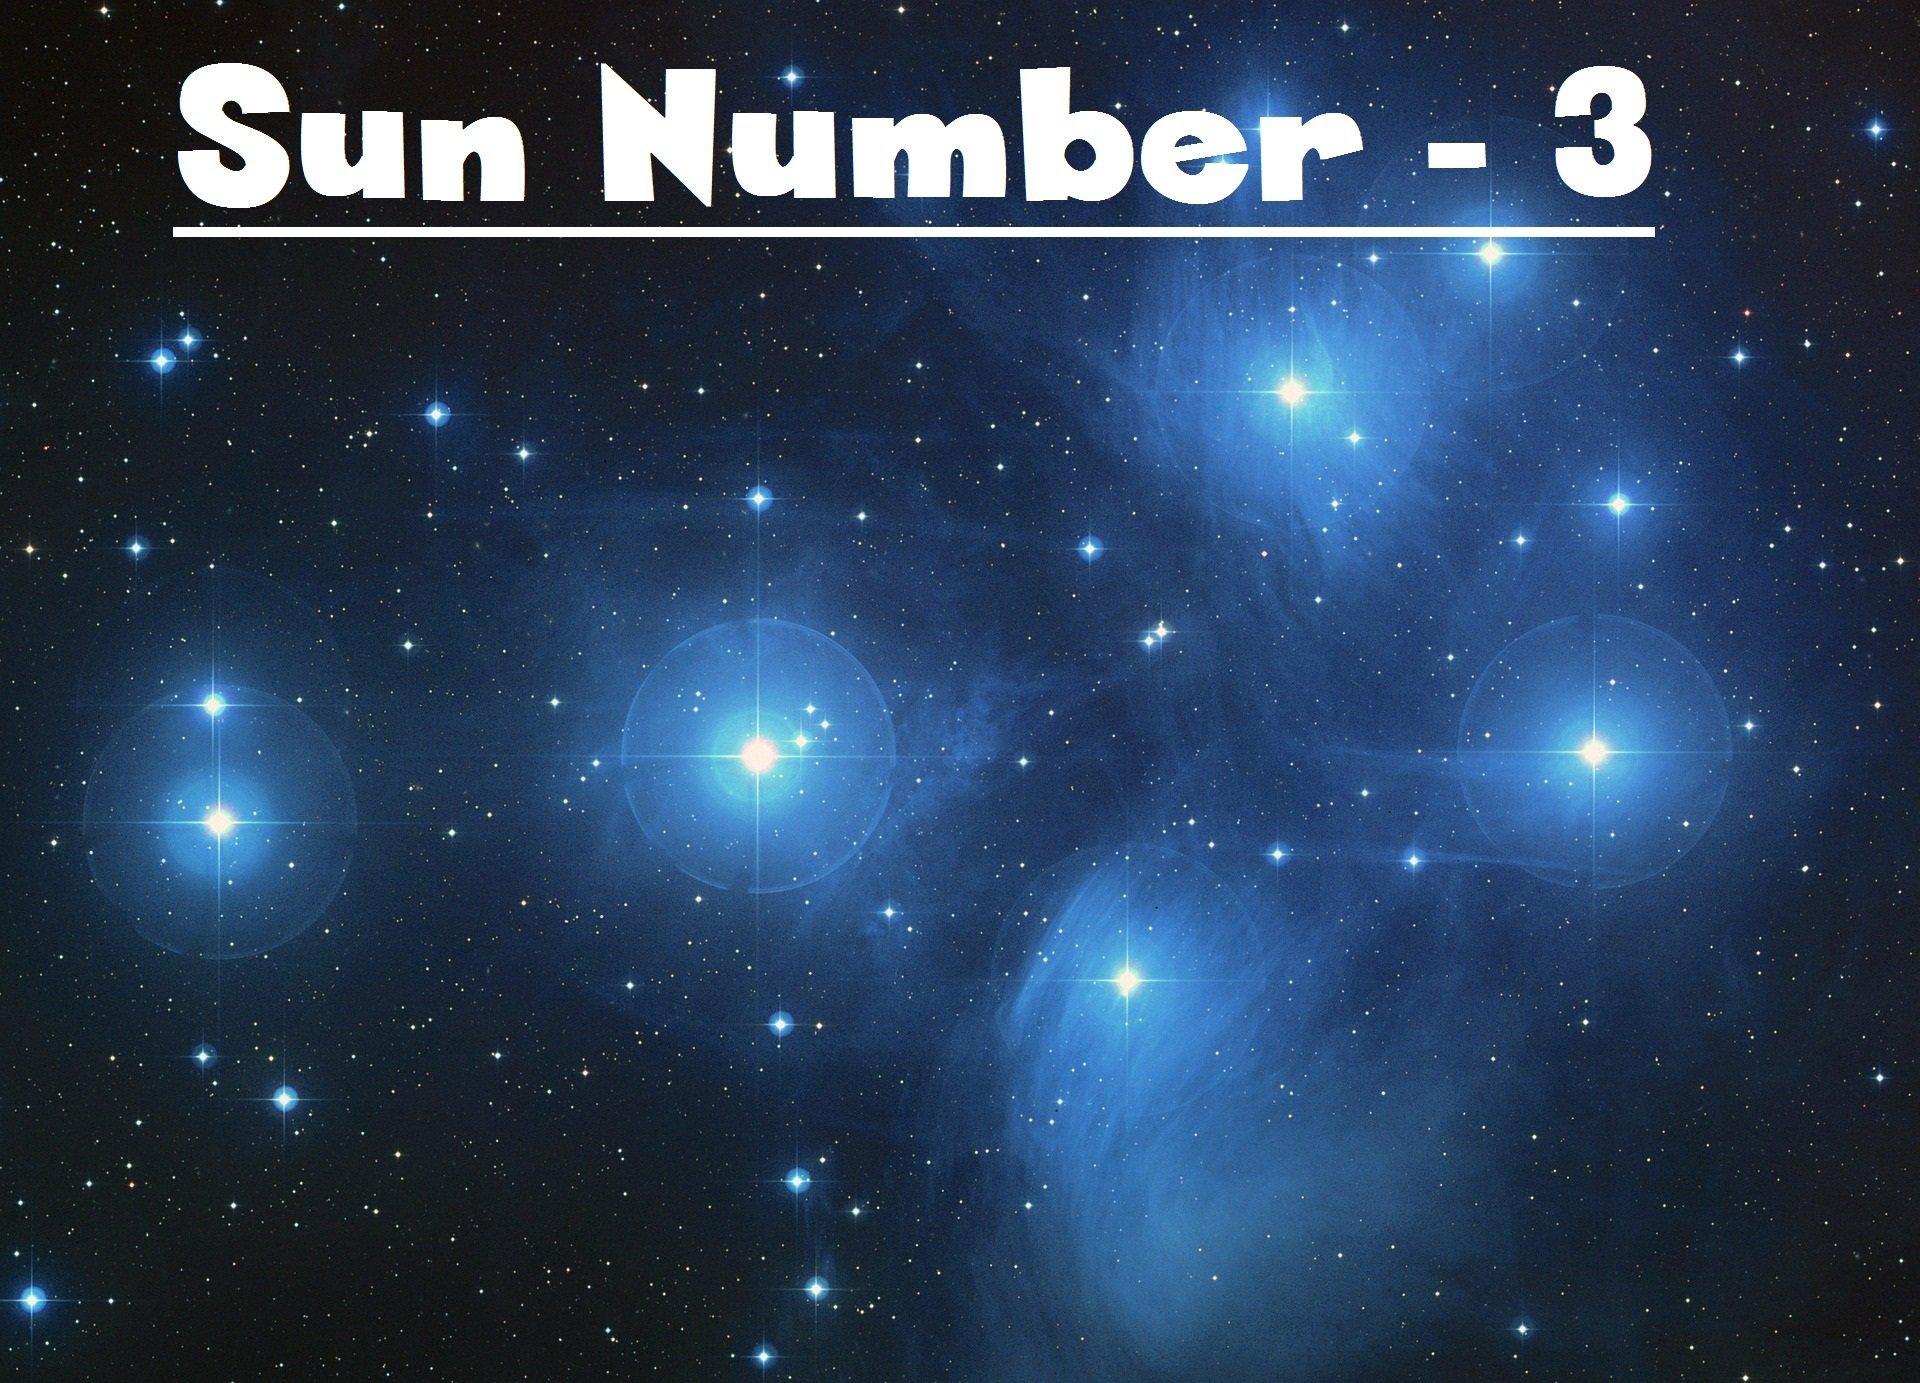 Sun Number - 3